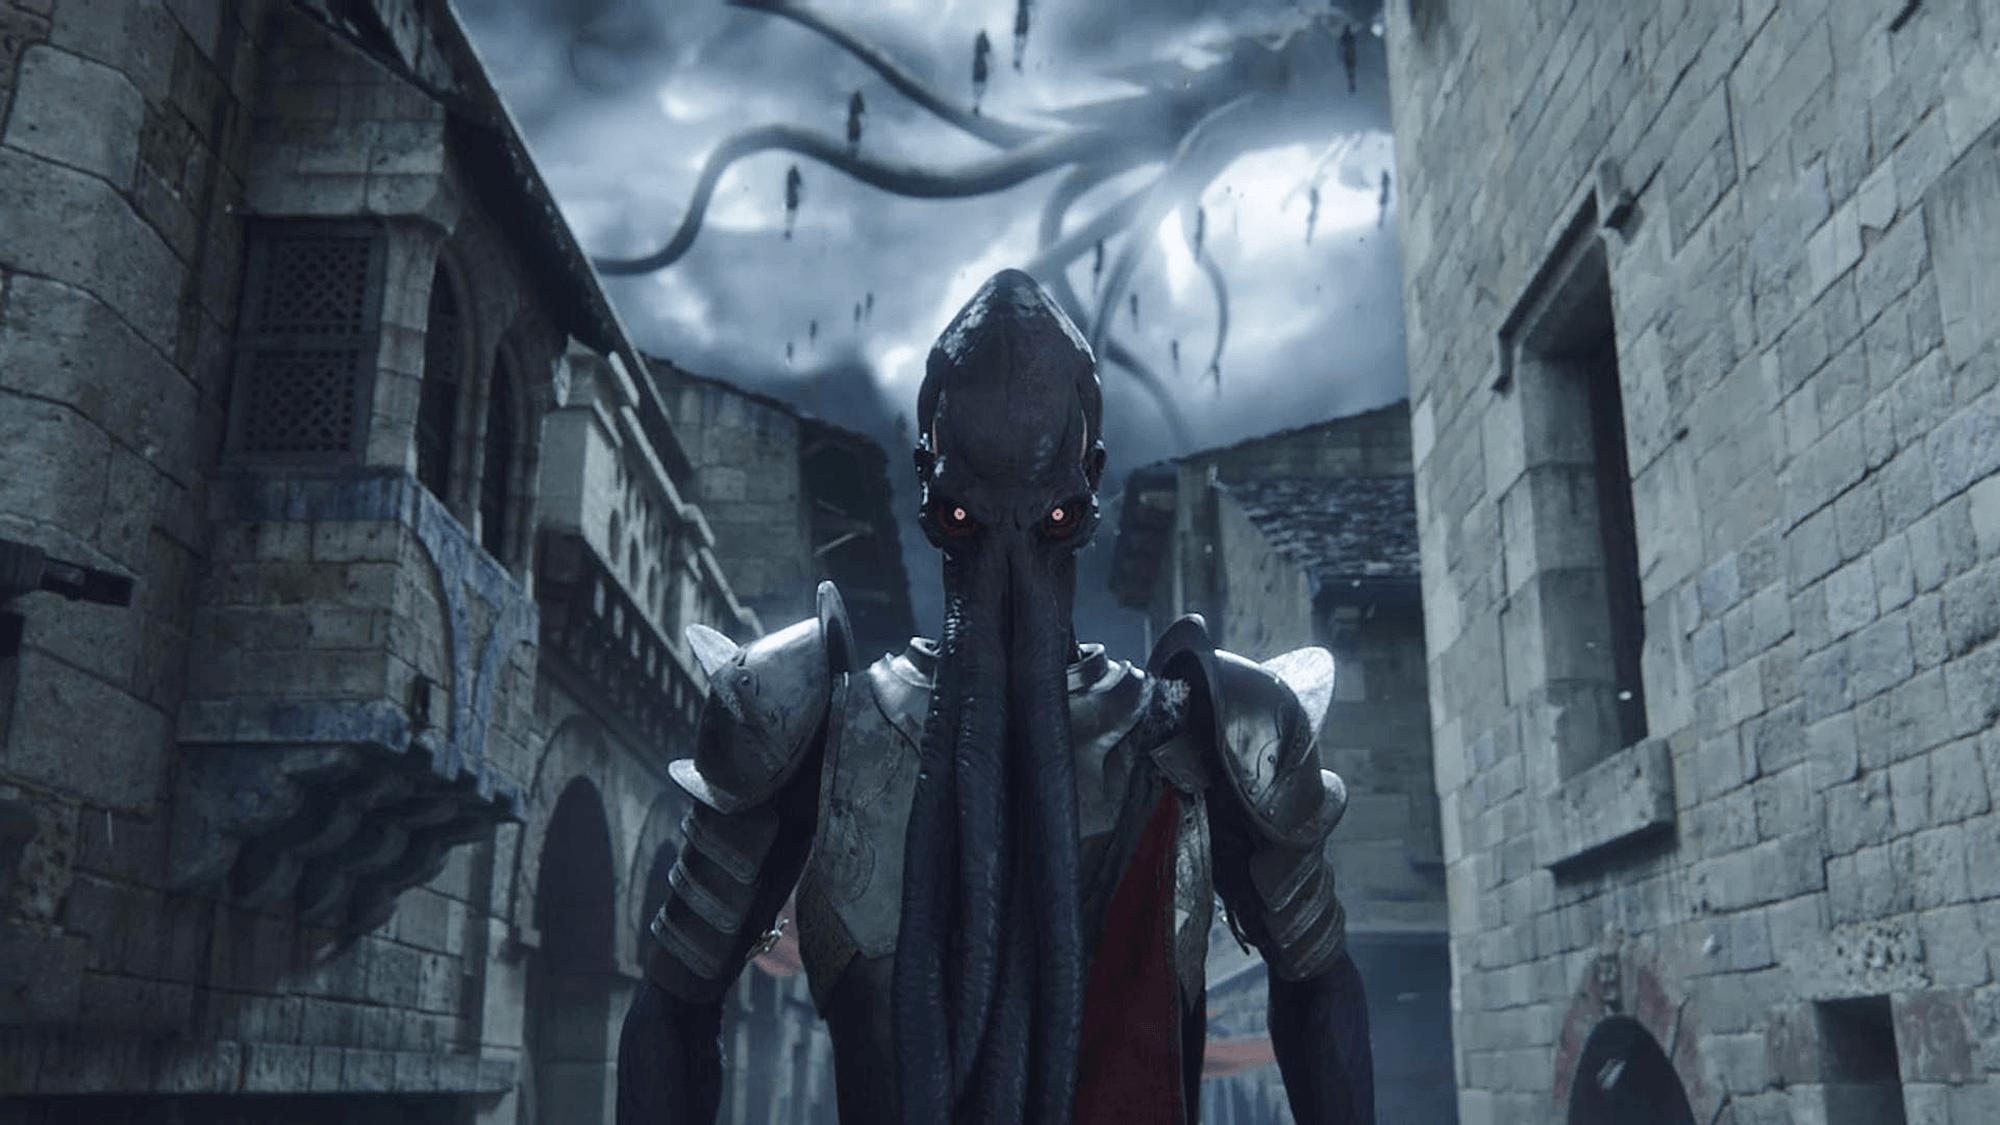 The Baldur's Gate 3 thumbnail image